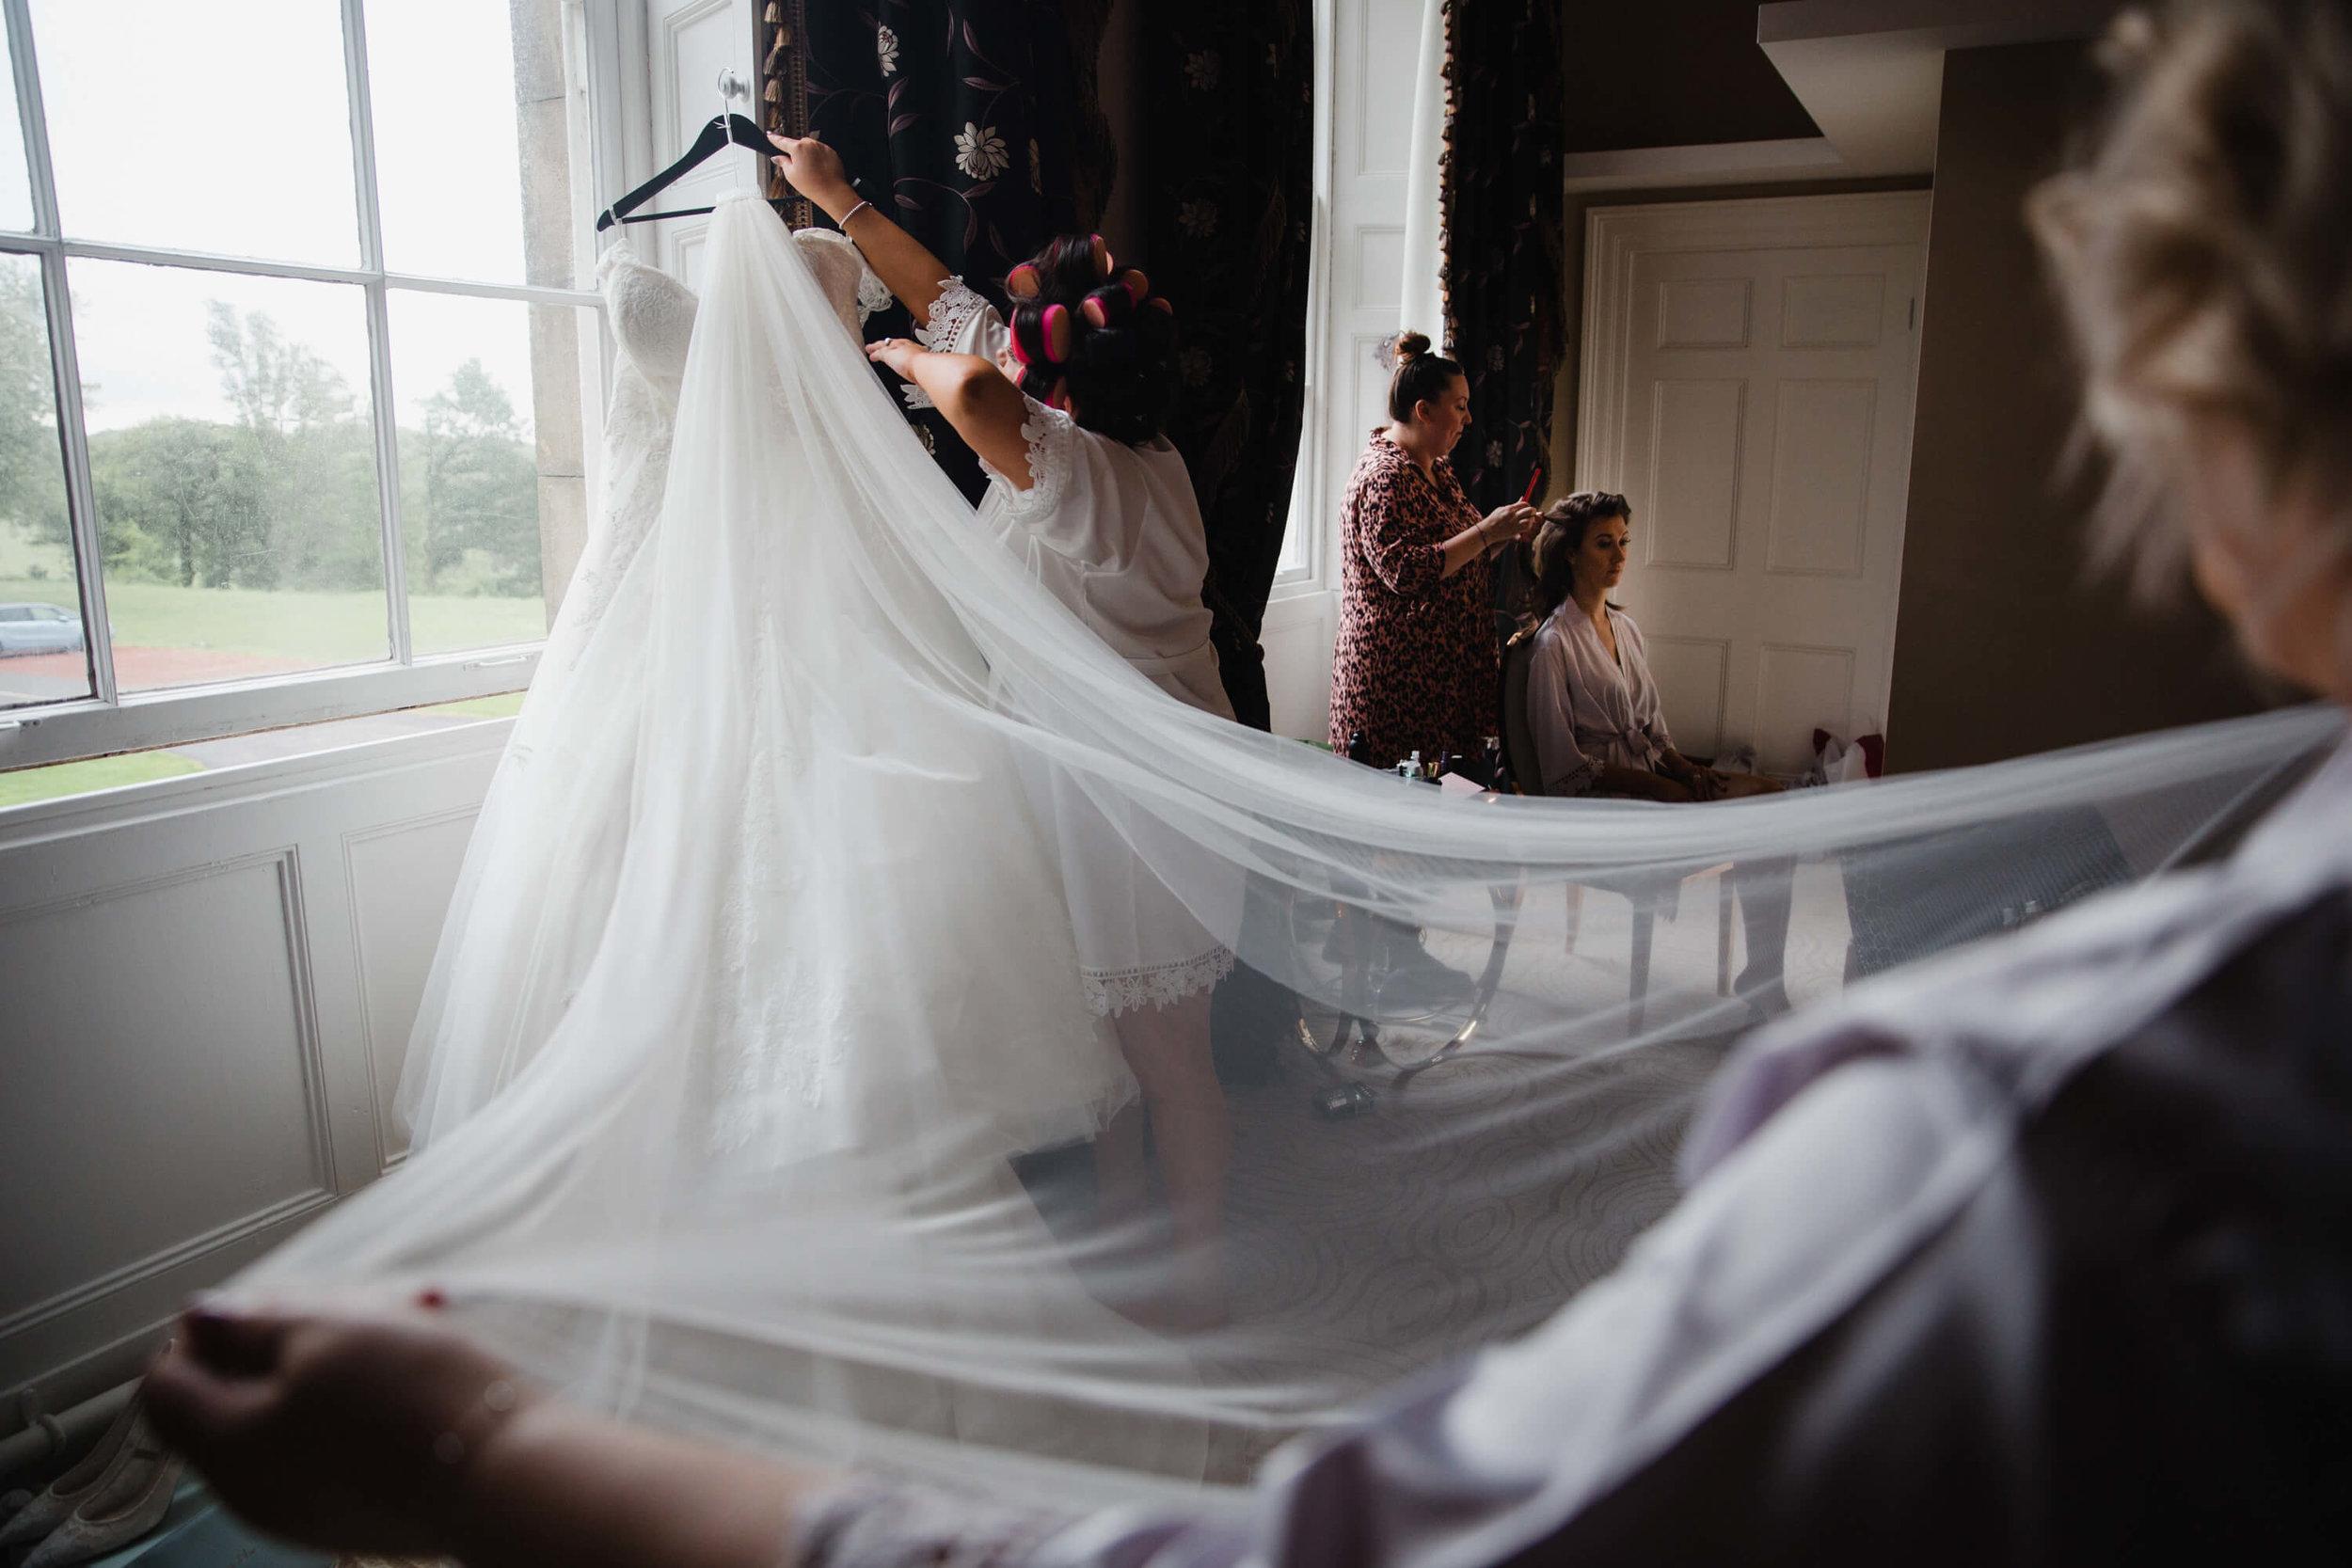 bridesmaid holding wedding dress veil for bride during wedding preparation